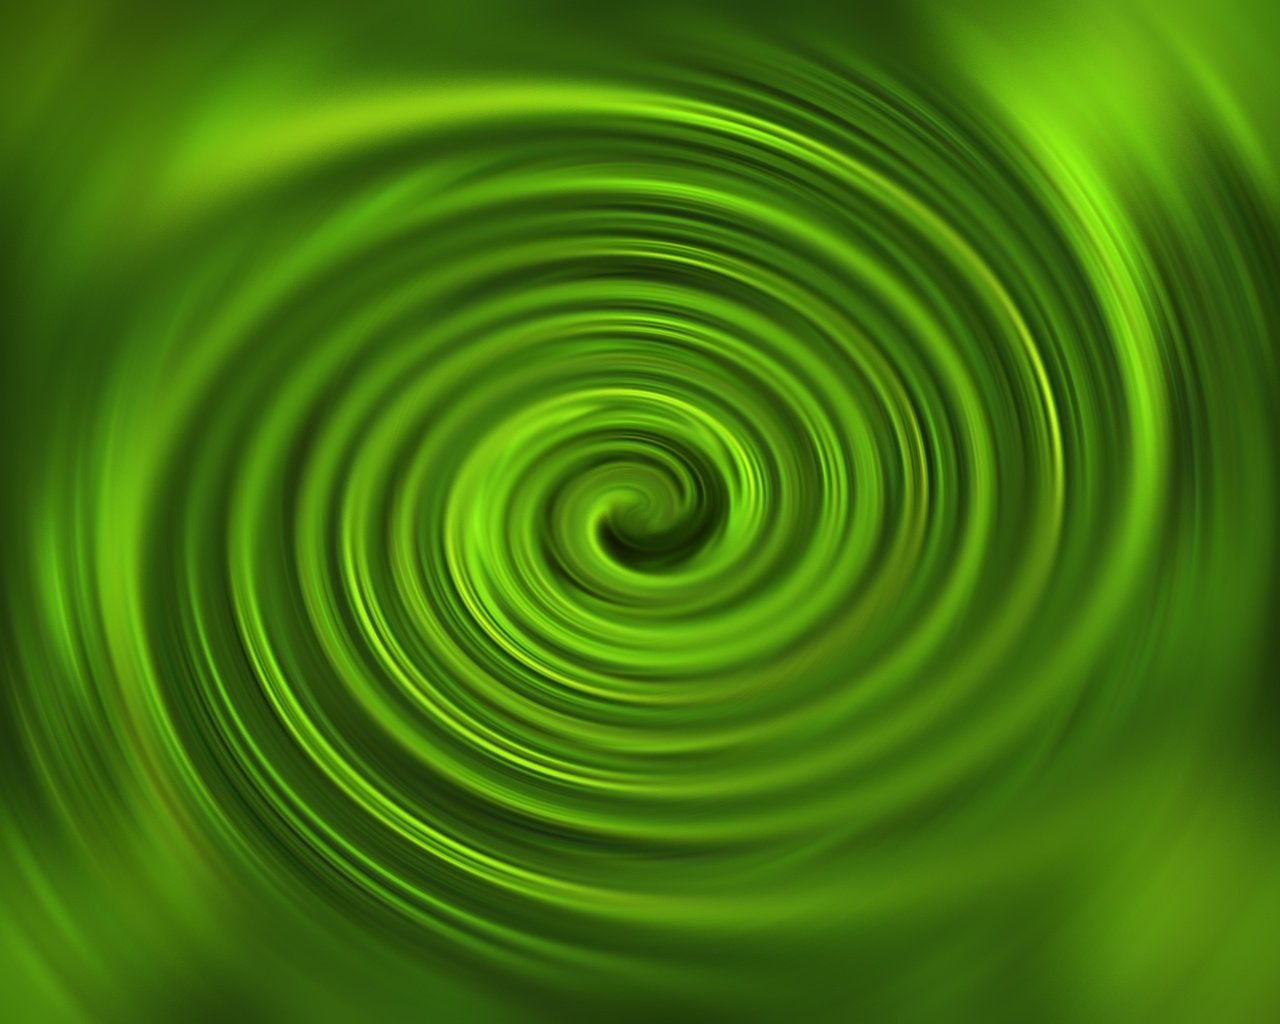 green swirl wallpaper wallpapersafari. Black Bedroom Furniture Sets. Home Design Ideas